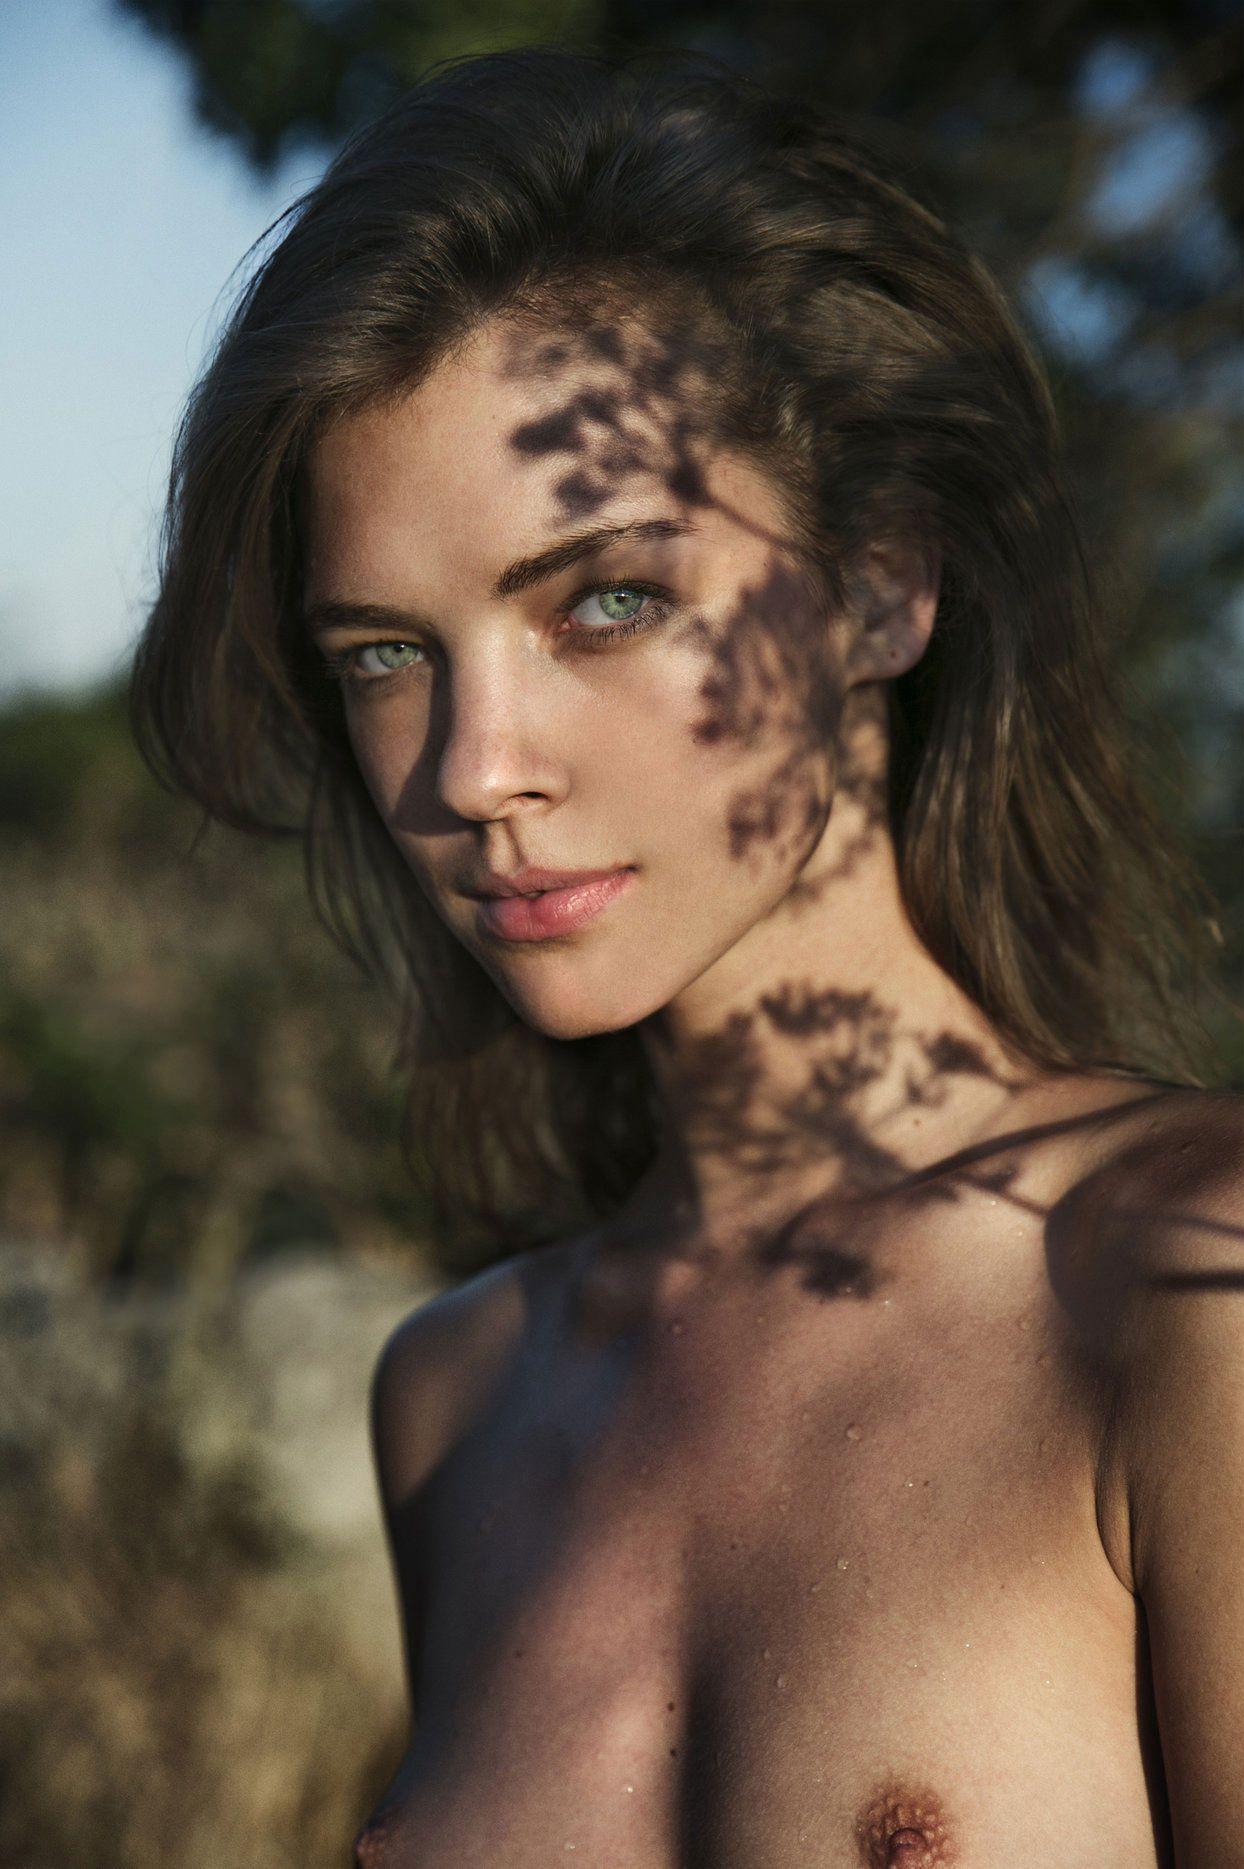 Djaja Baecke naked (65 photos), pics Ass, Twitter, underwear 2016